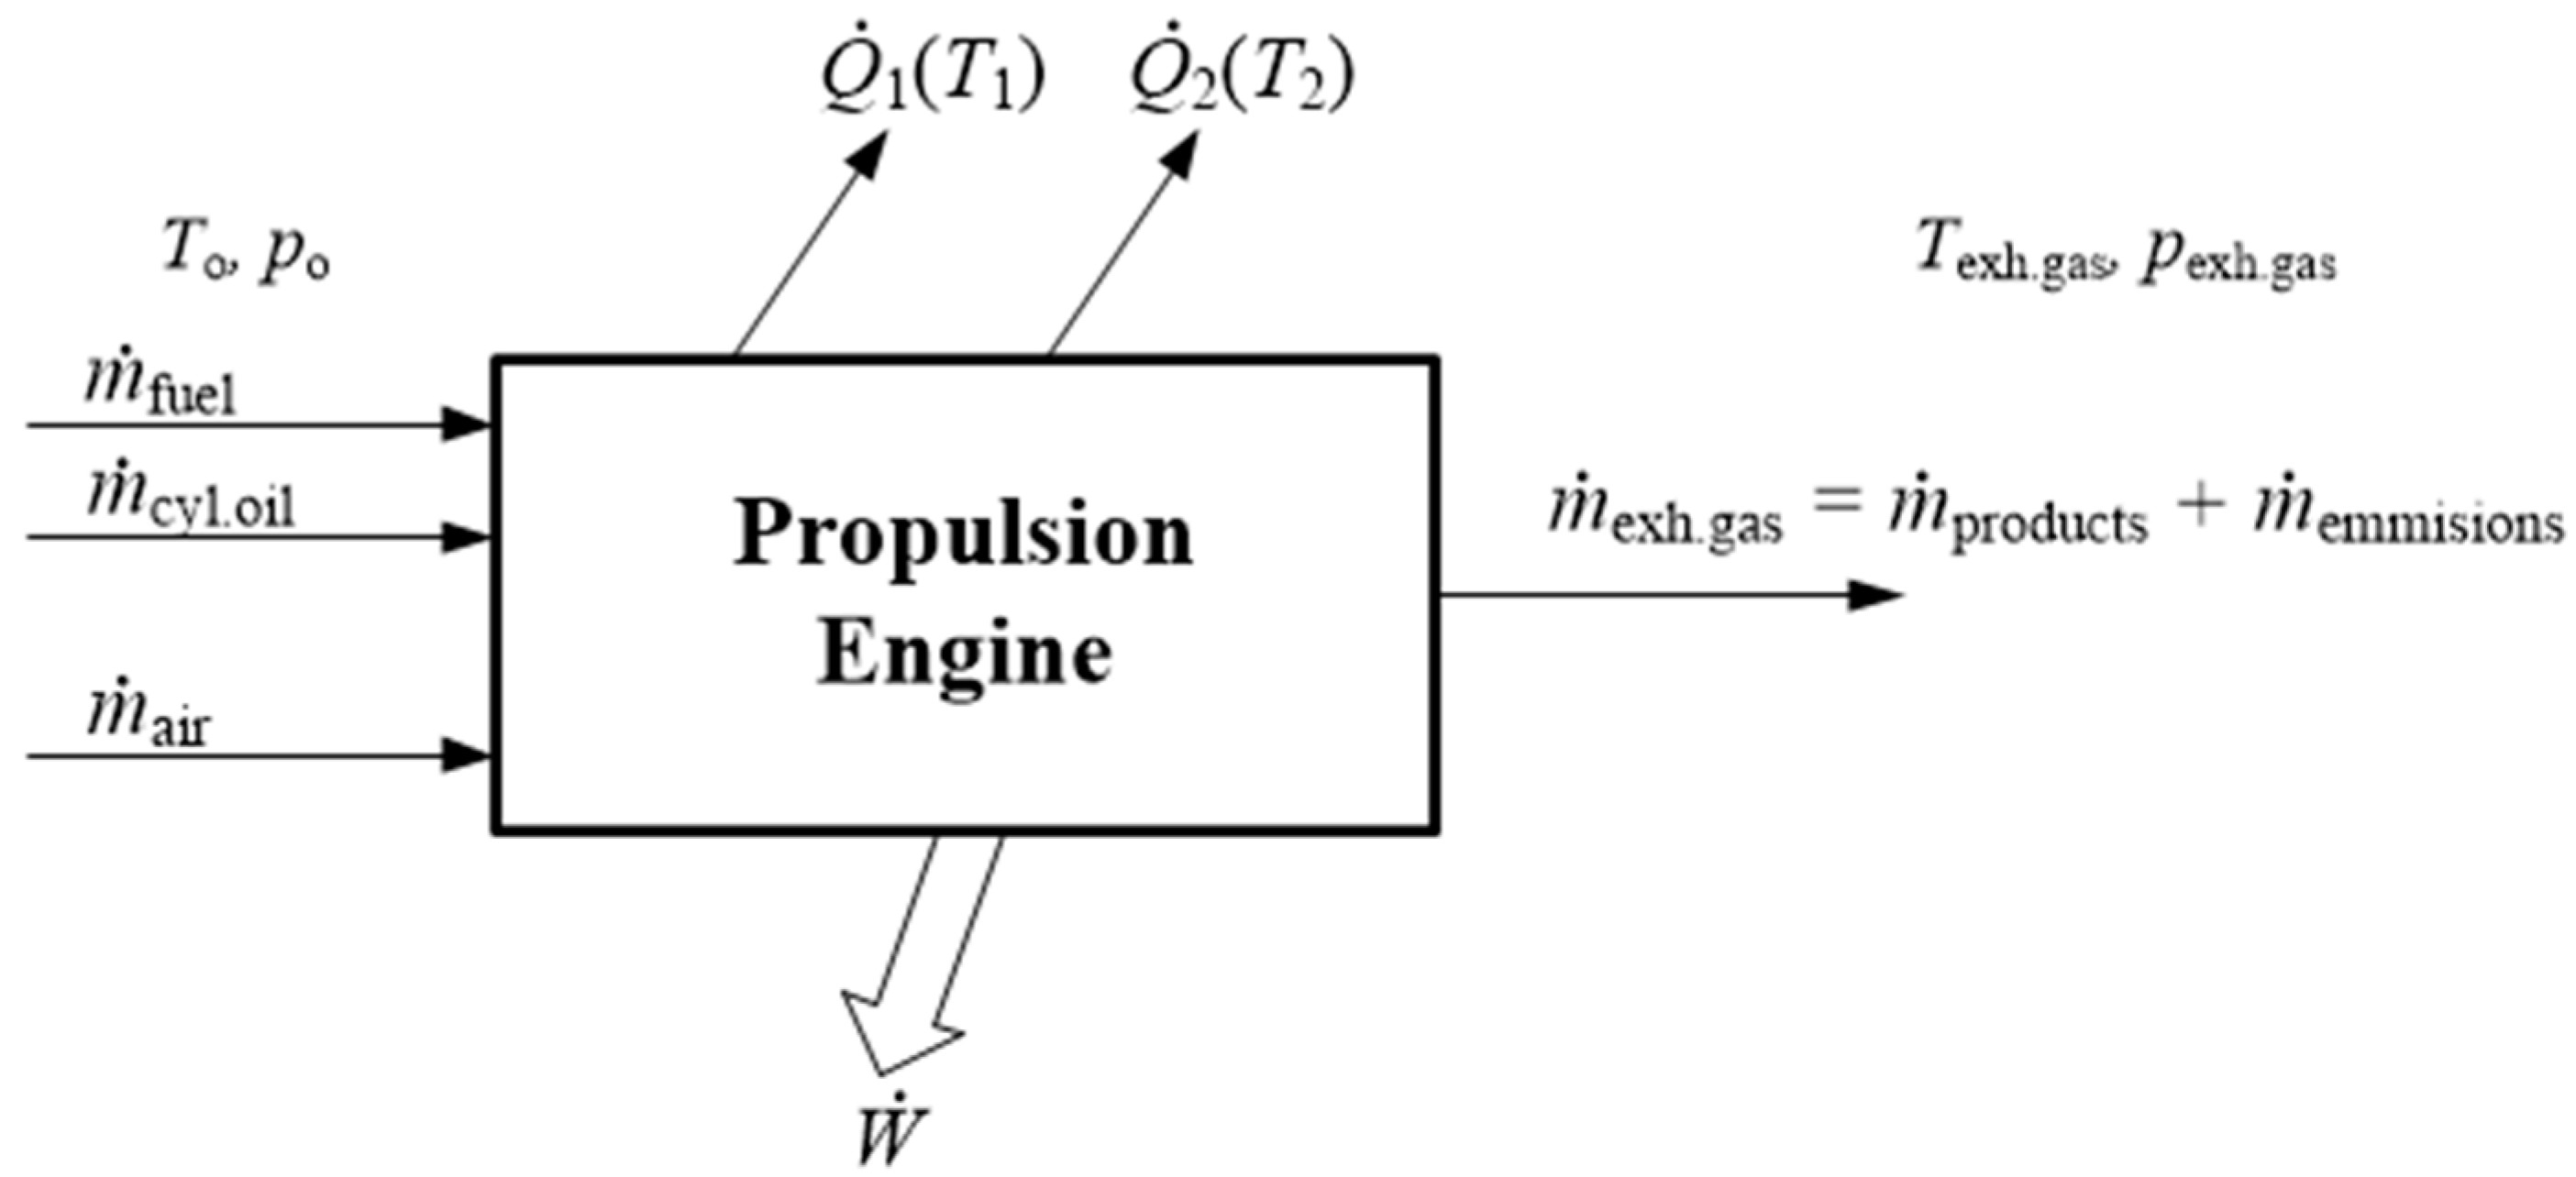 2 Stroke Engine Timing Diagram Energies Free Full Text Of 2 Stroke Engine Timing Diagram